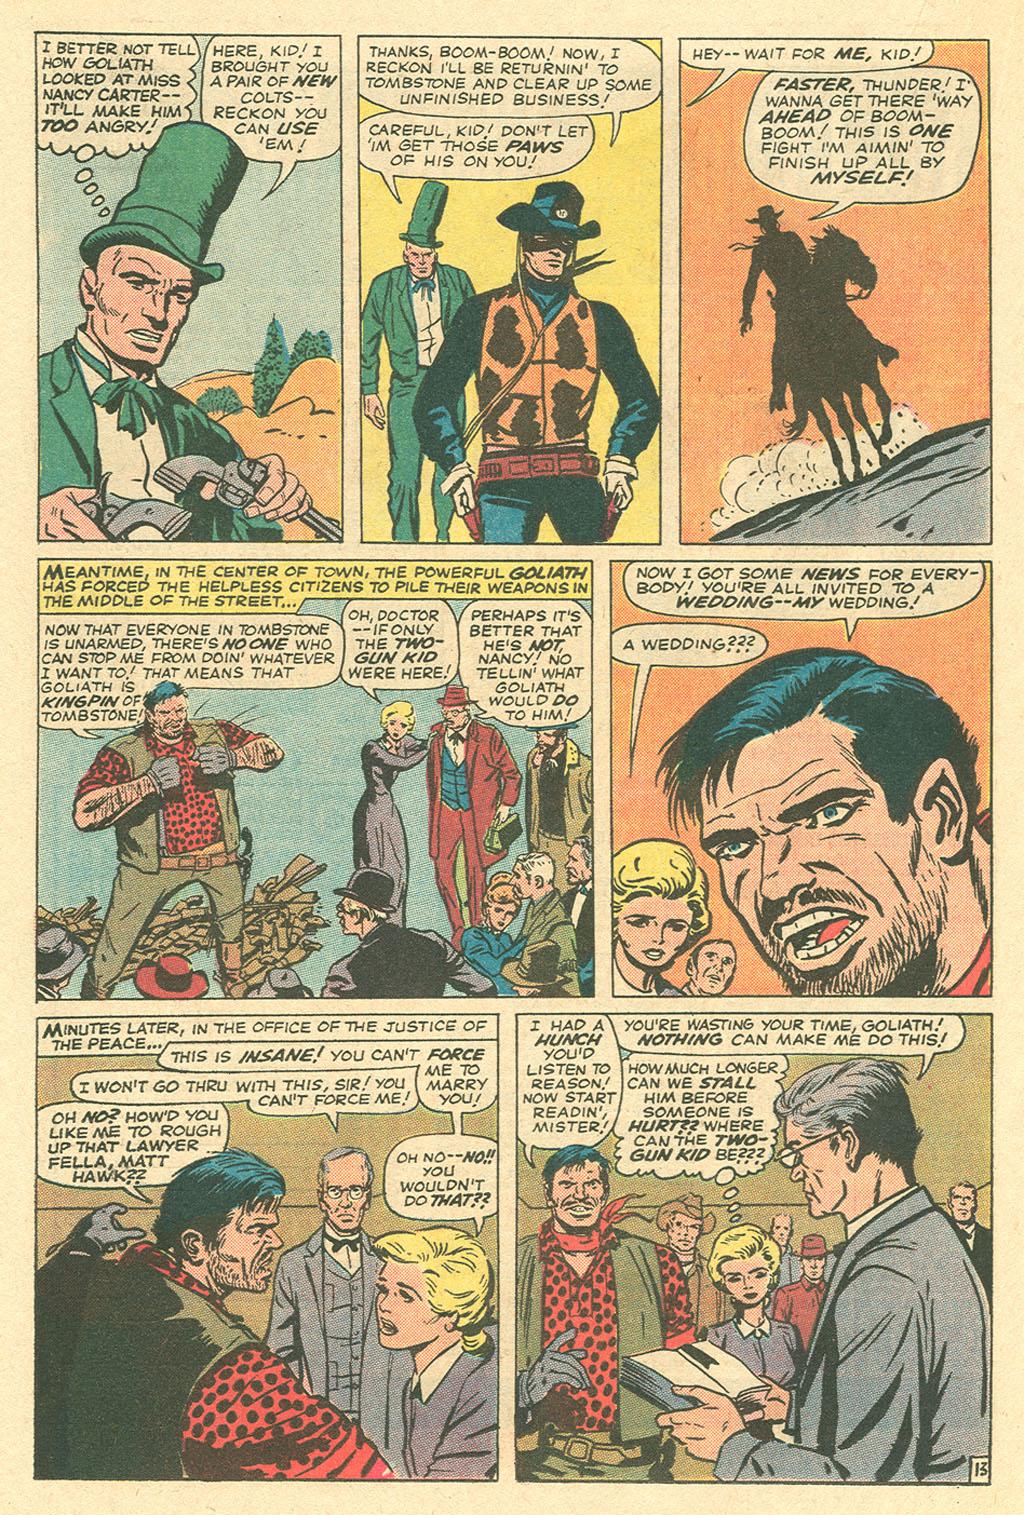 Read online Two-Gun Kid comic -  Issue #105 - 19